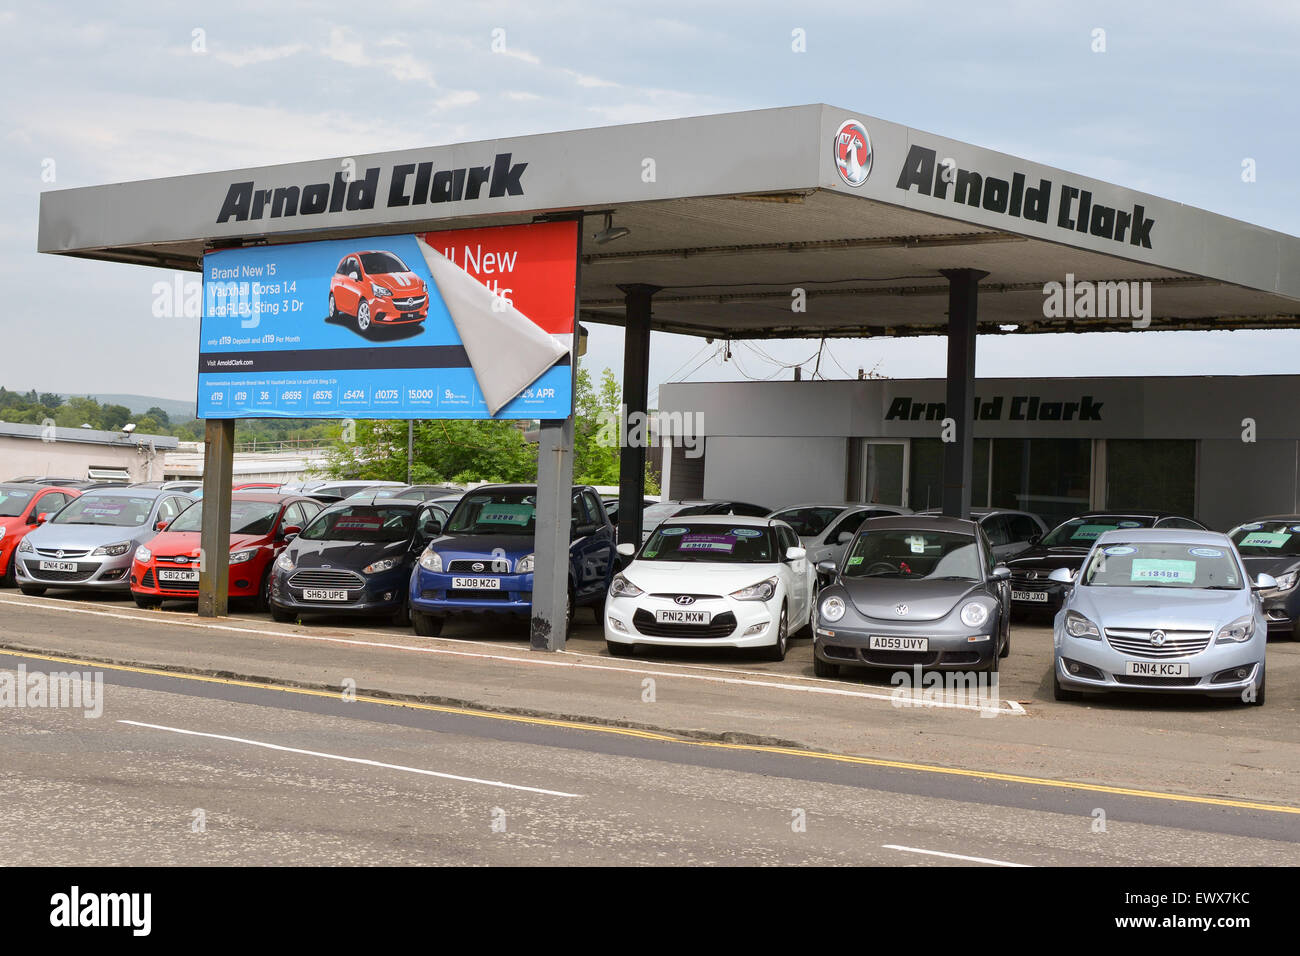 Arnold Clark Vauxhall Ford Car Dealership Milngavie Glasgow Scotland Uk